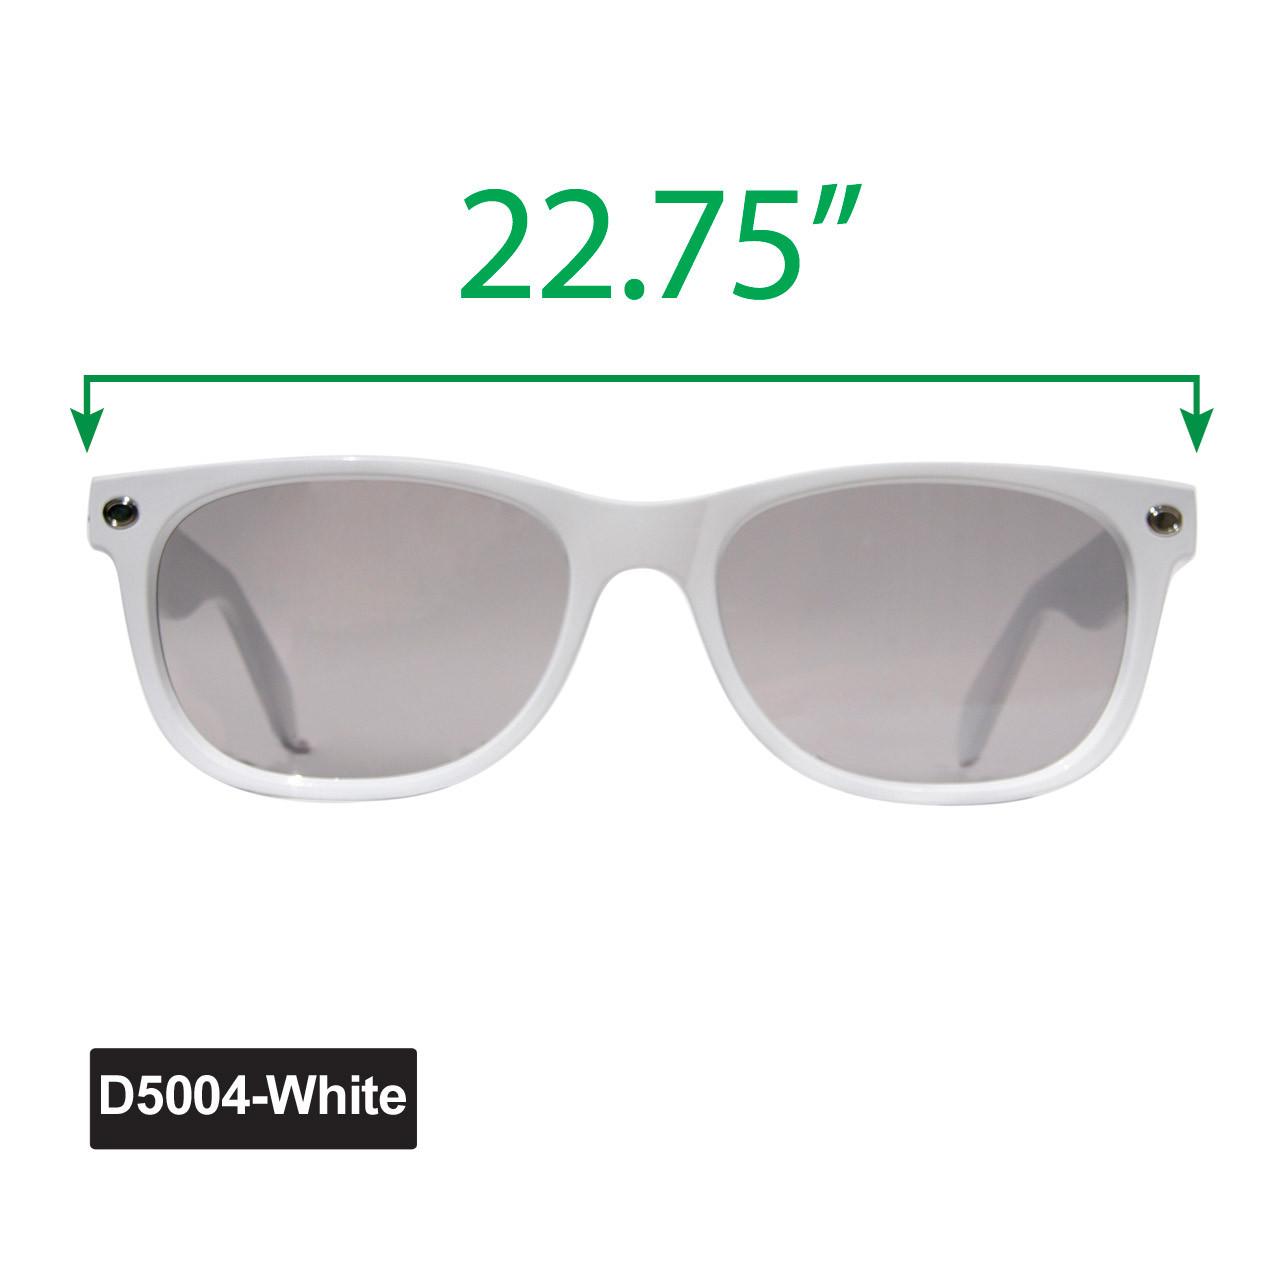 Large California Classics Sunglasses - Display D5004-White